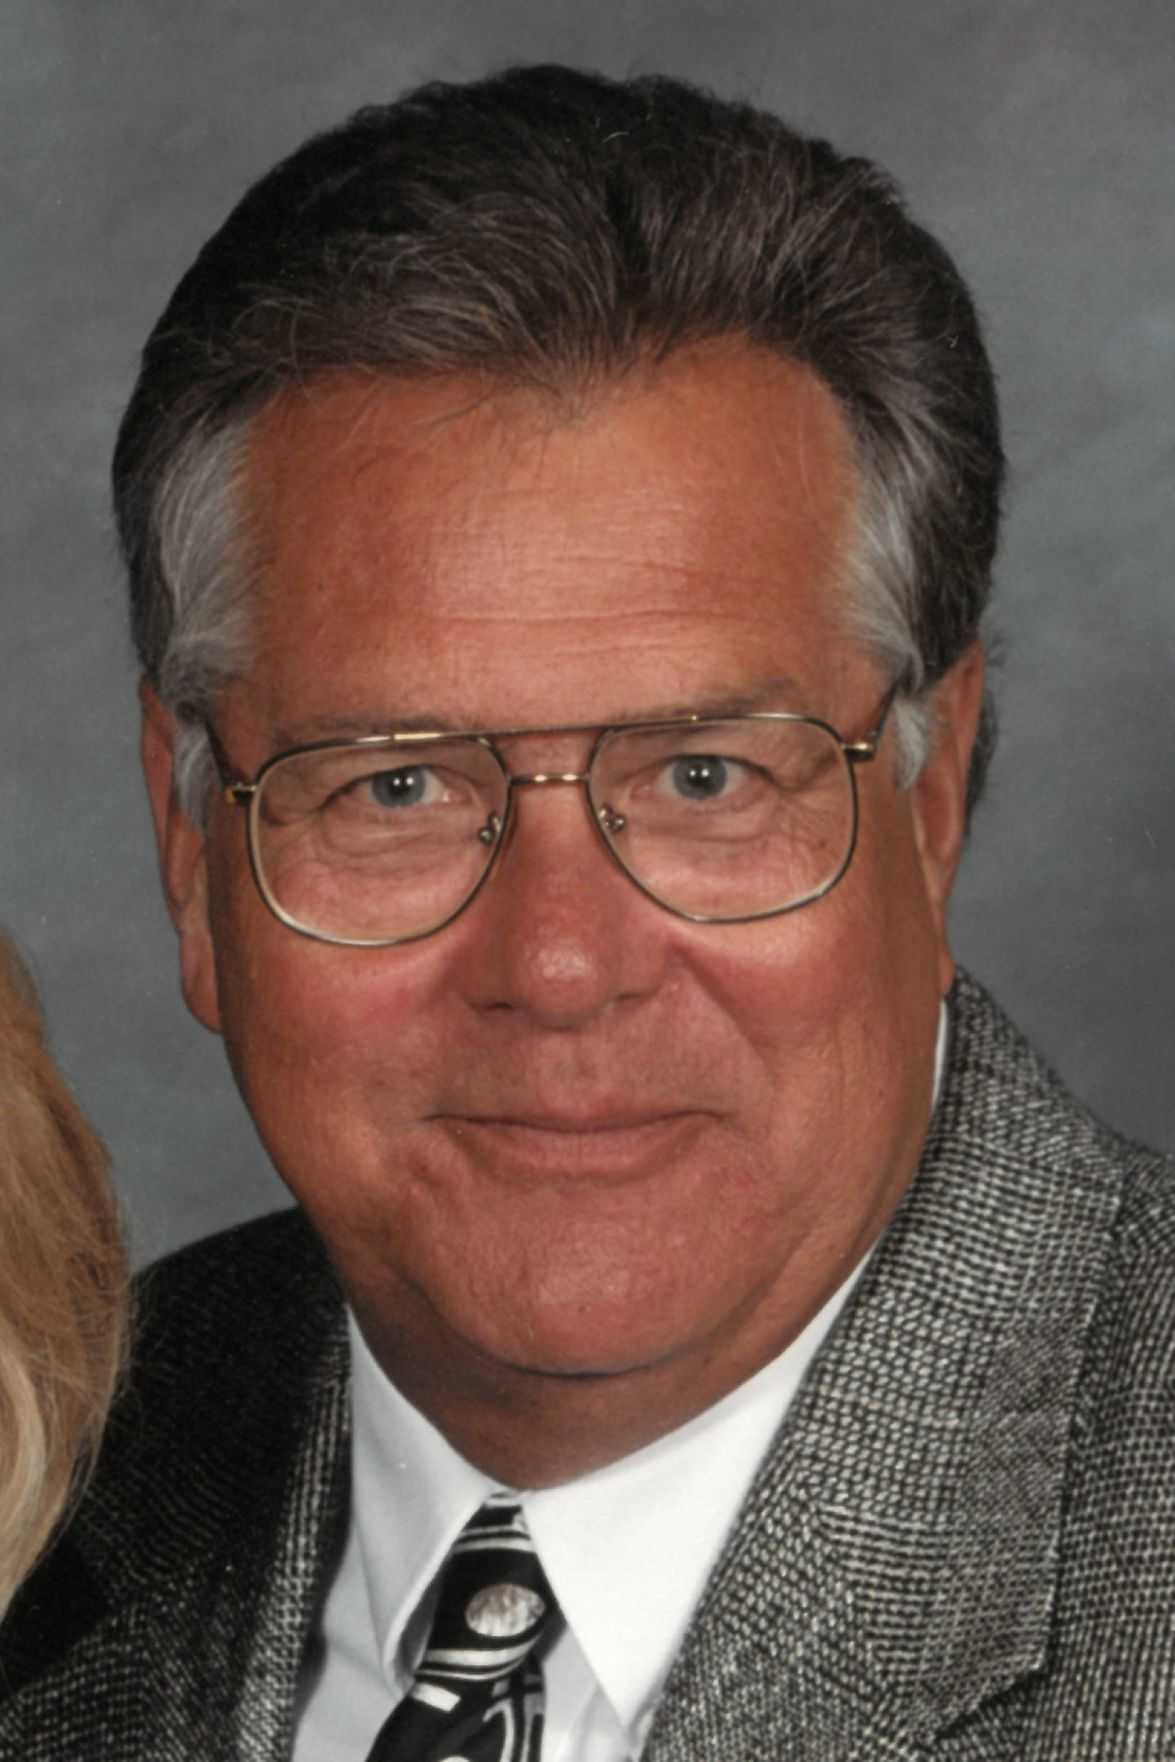 Peter Kuklinski